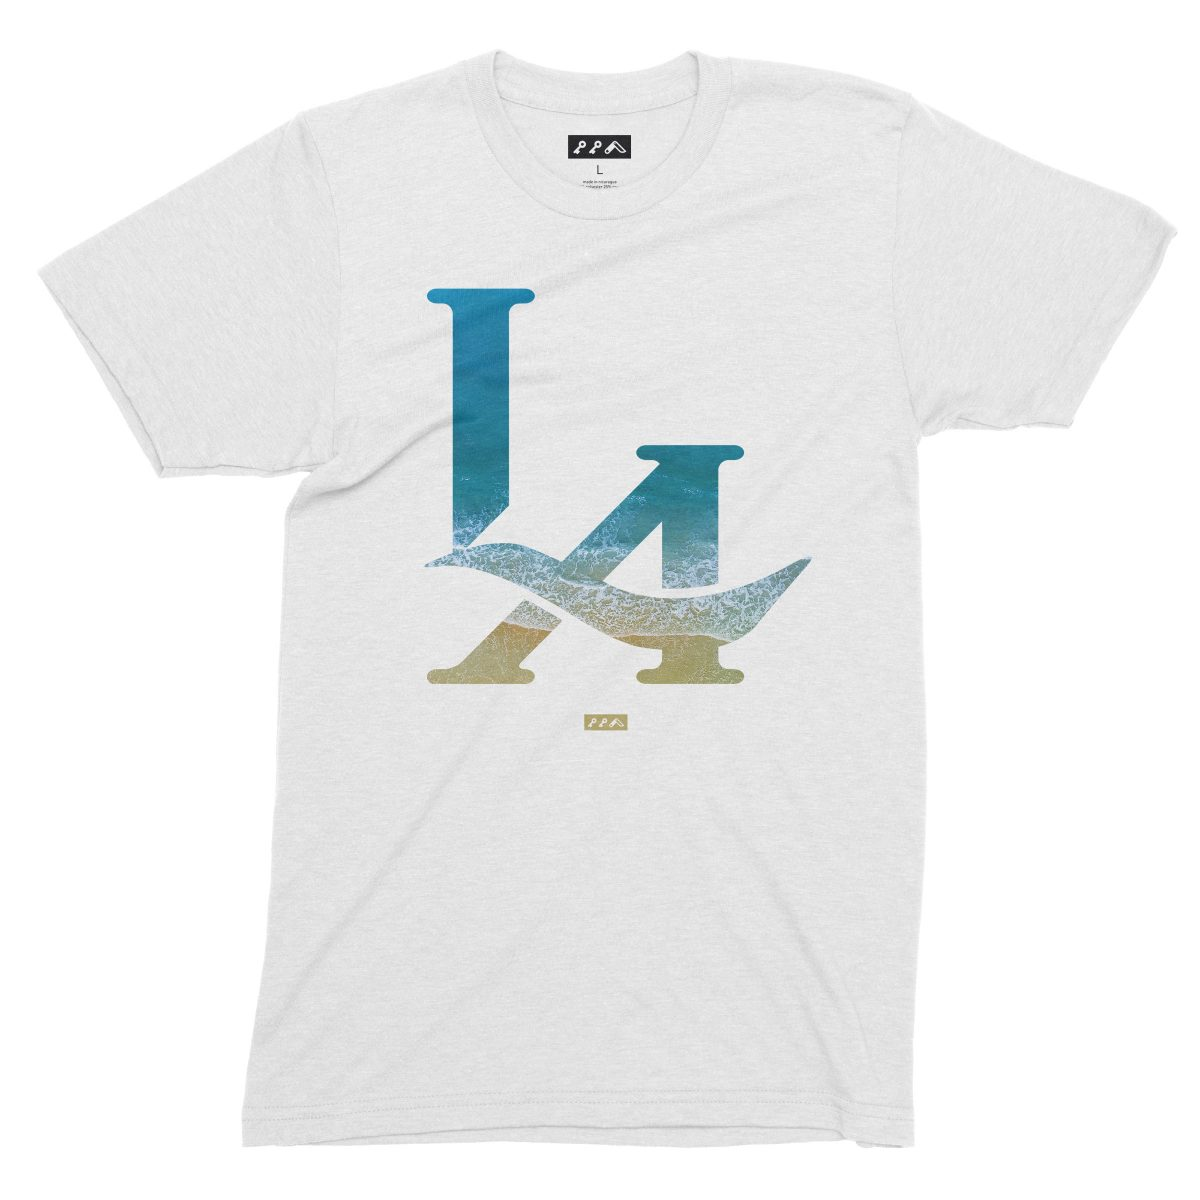 LA logo los angeles ocean venice beach t-shirt in white by kikicutt